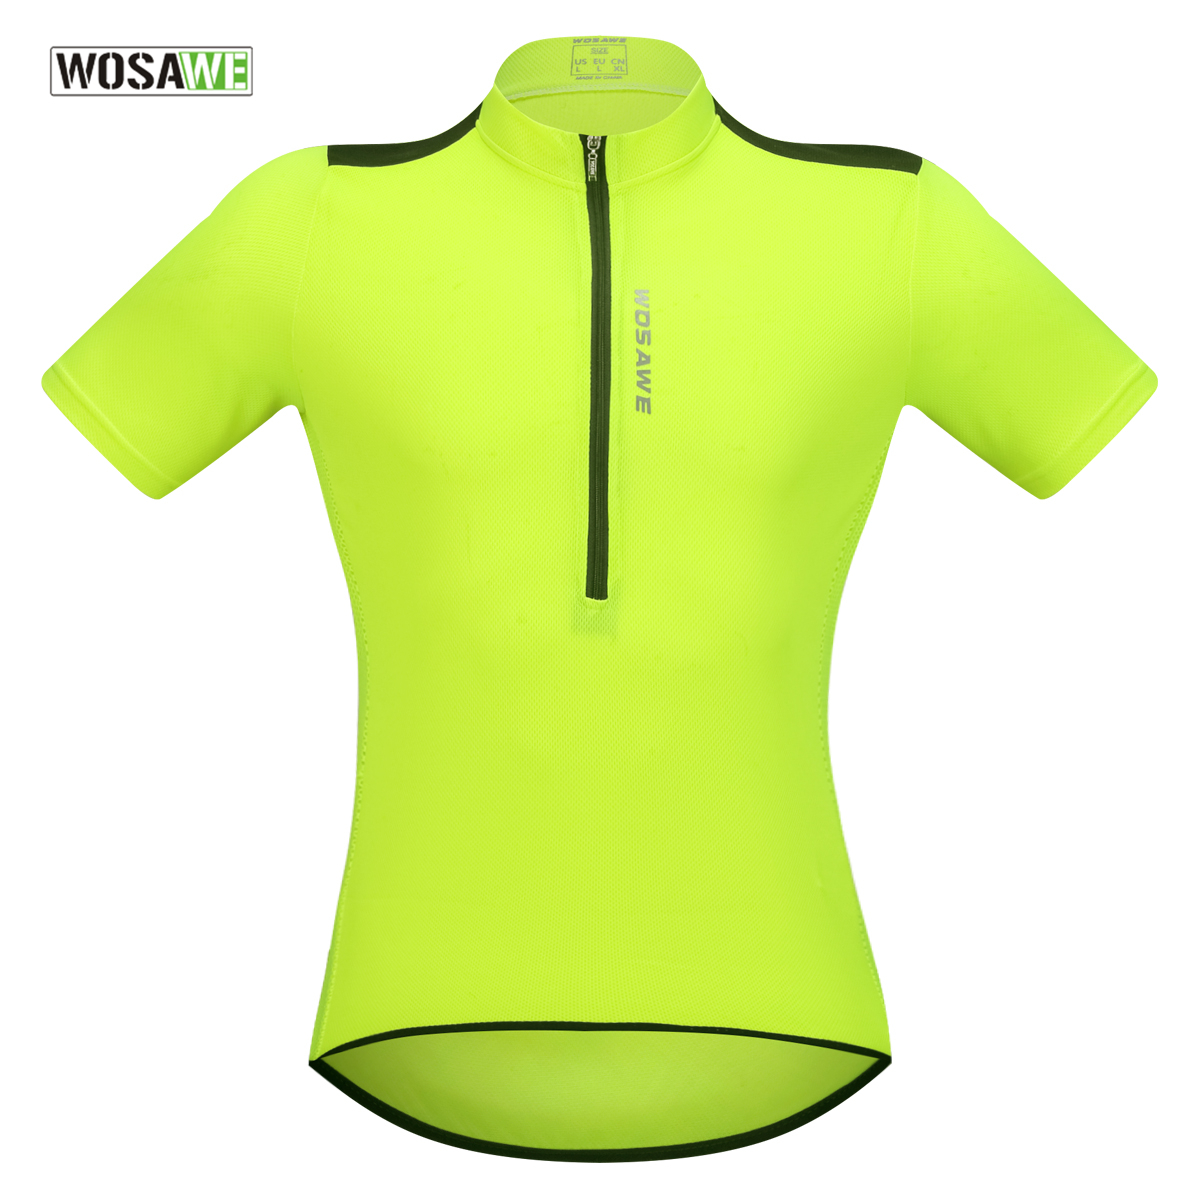 WOSAWE Radfahren Jersey 2018 Pro Team Mtb Jersey Atmungsaktivität Half Zip Maillot Ciclismo Kurzarm Bike Shirt